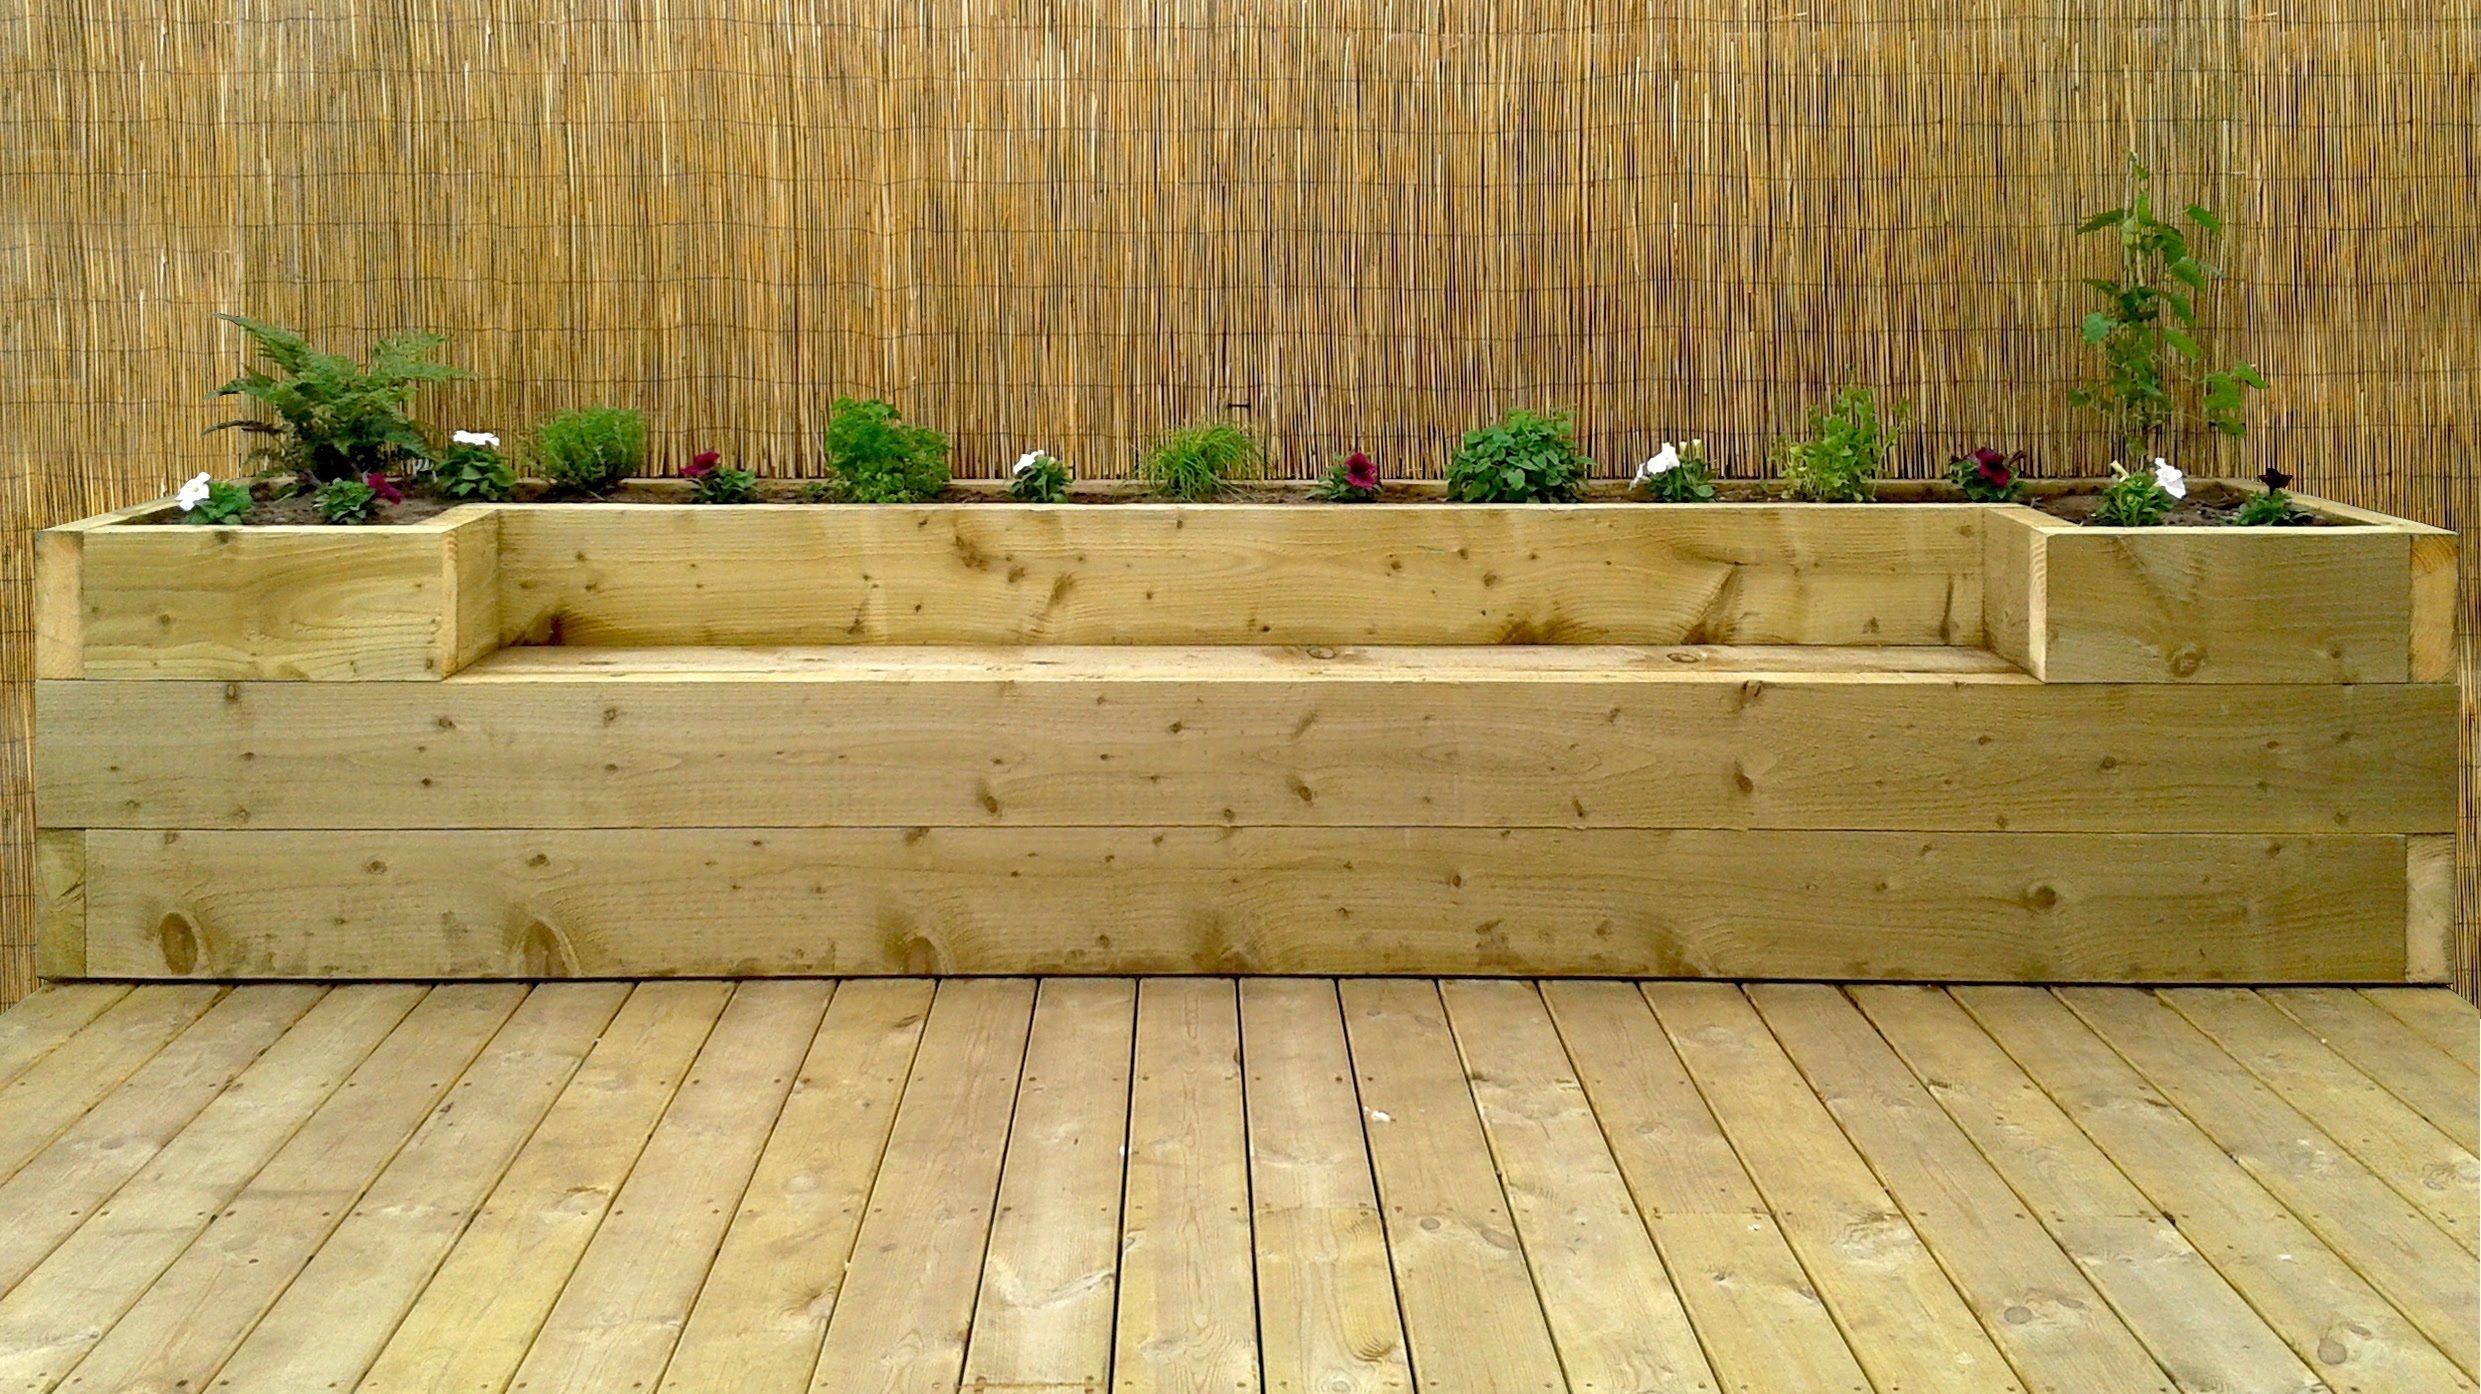 Pole Barn Kits Making Raised Garden Beds Building Raised Garden Beds Garden Seating